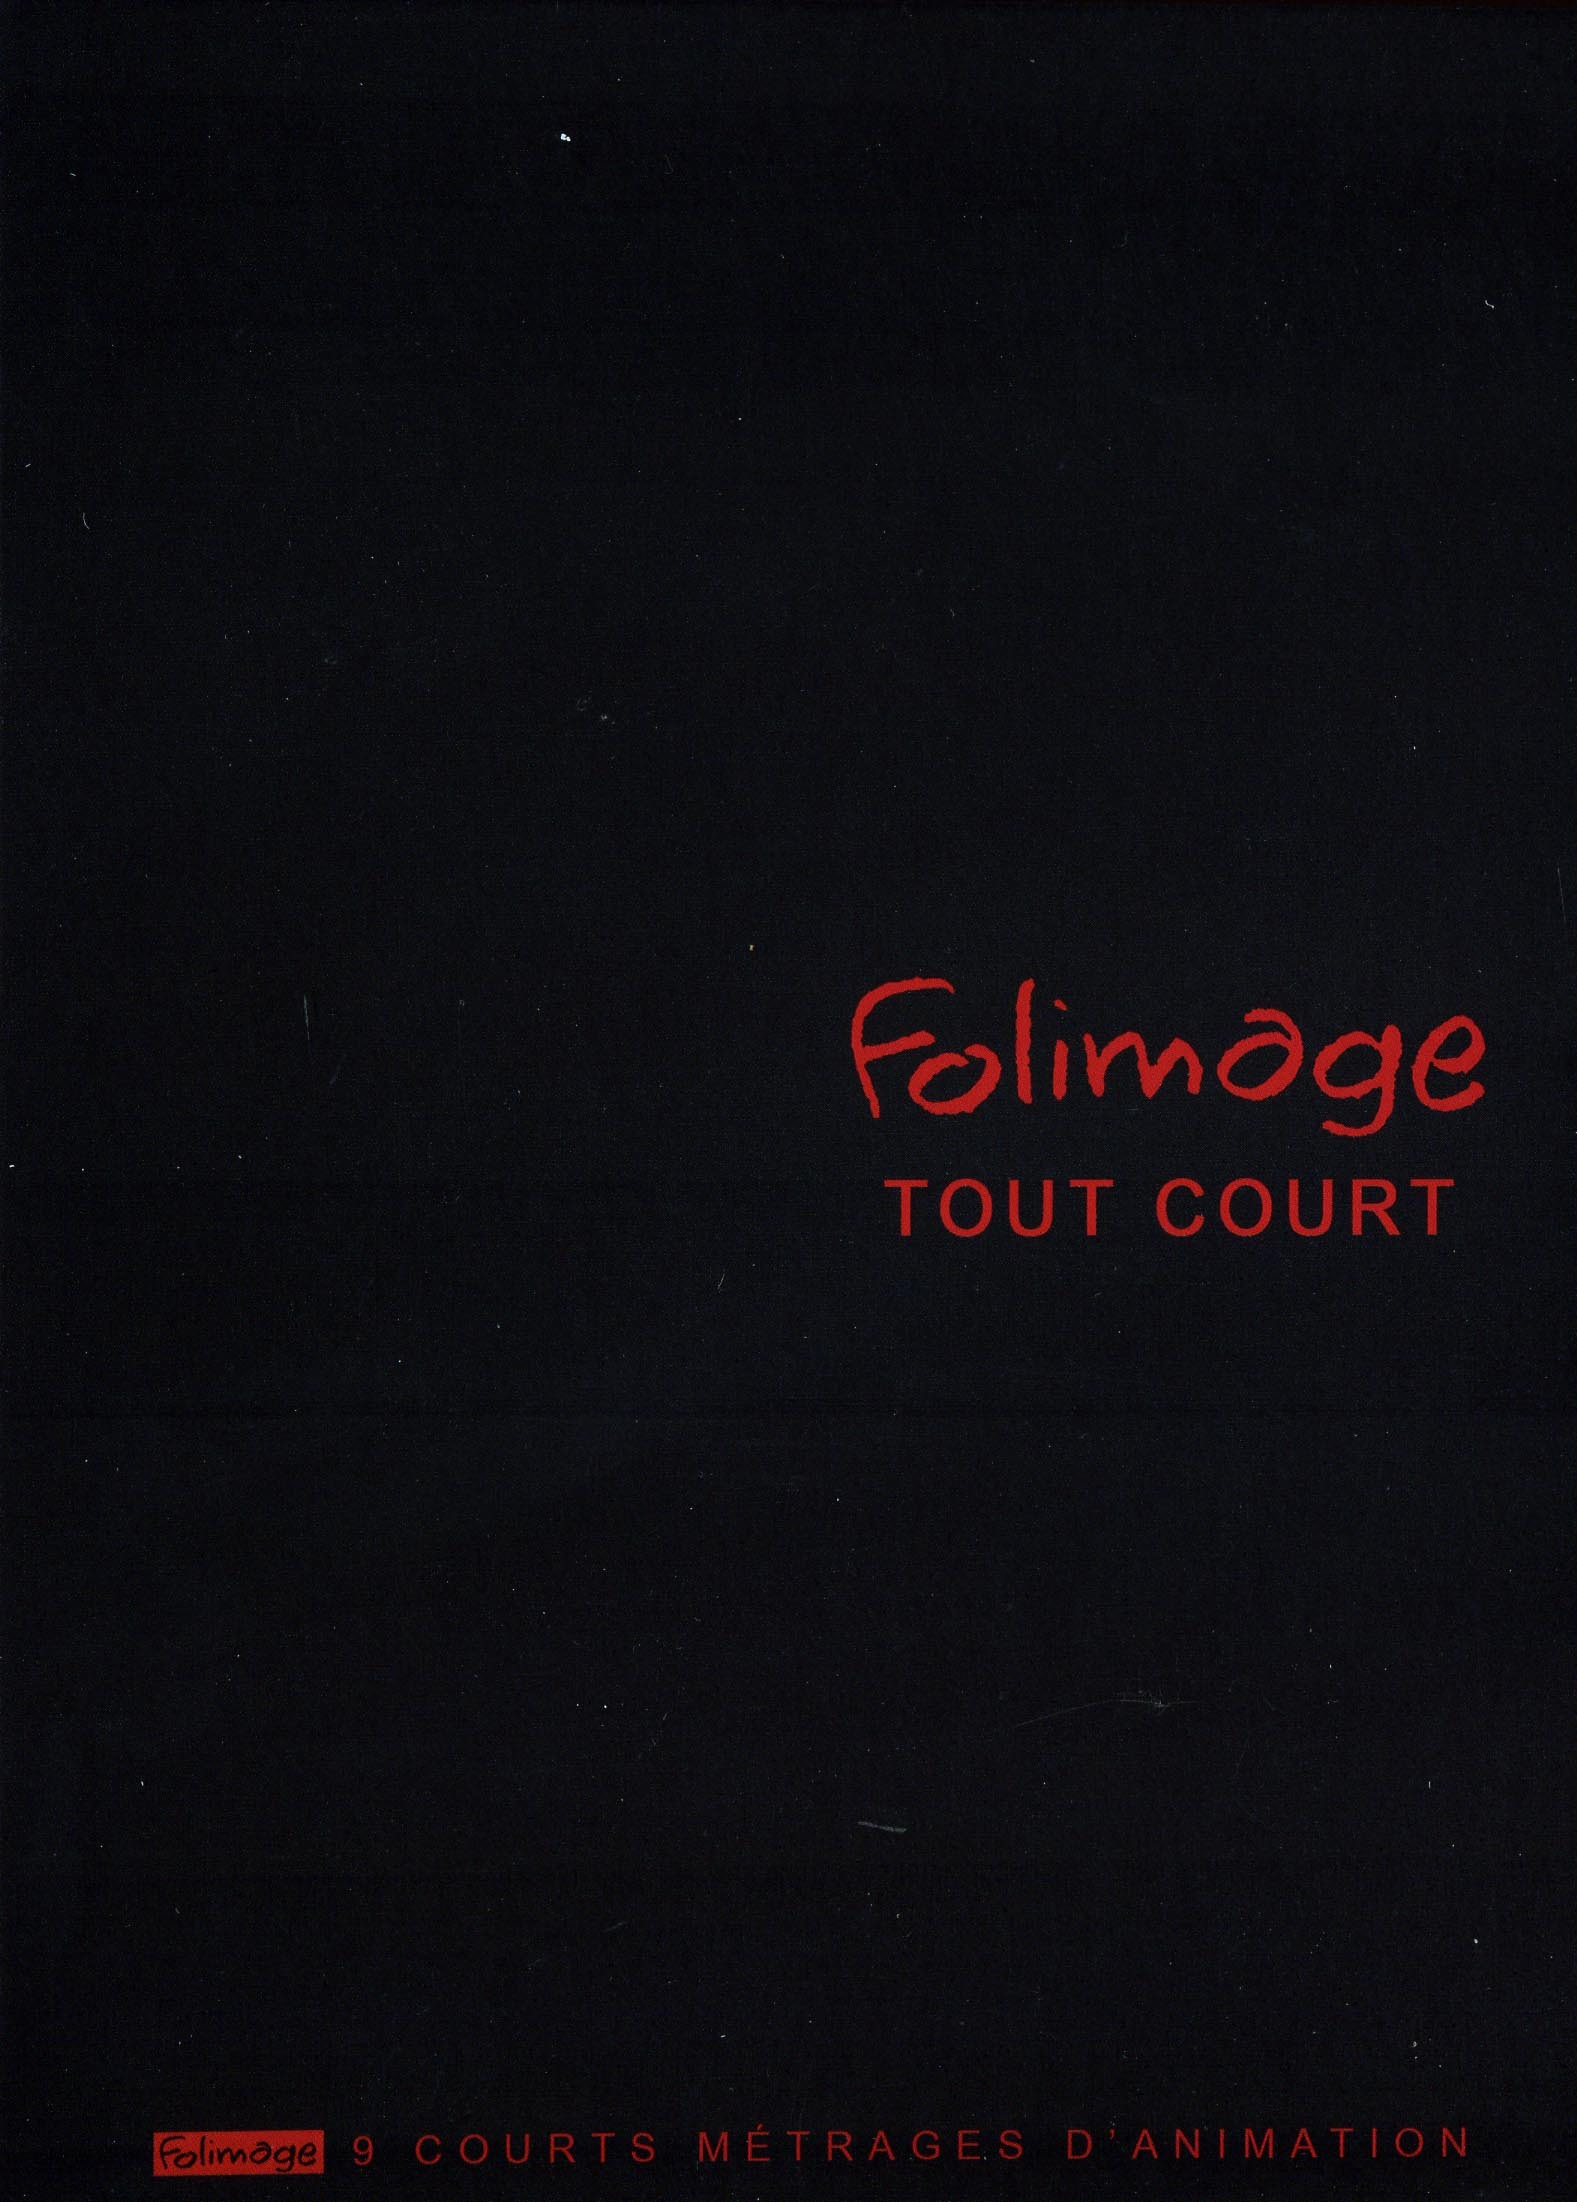 FOLIMAGE TOUT COURT - DVD